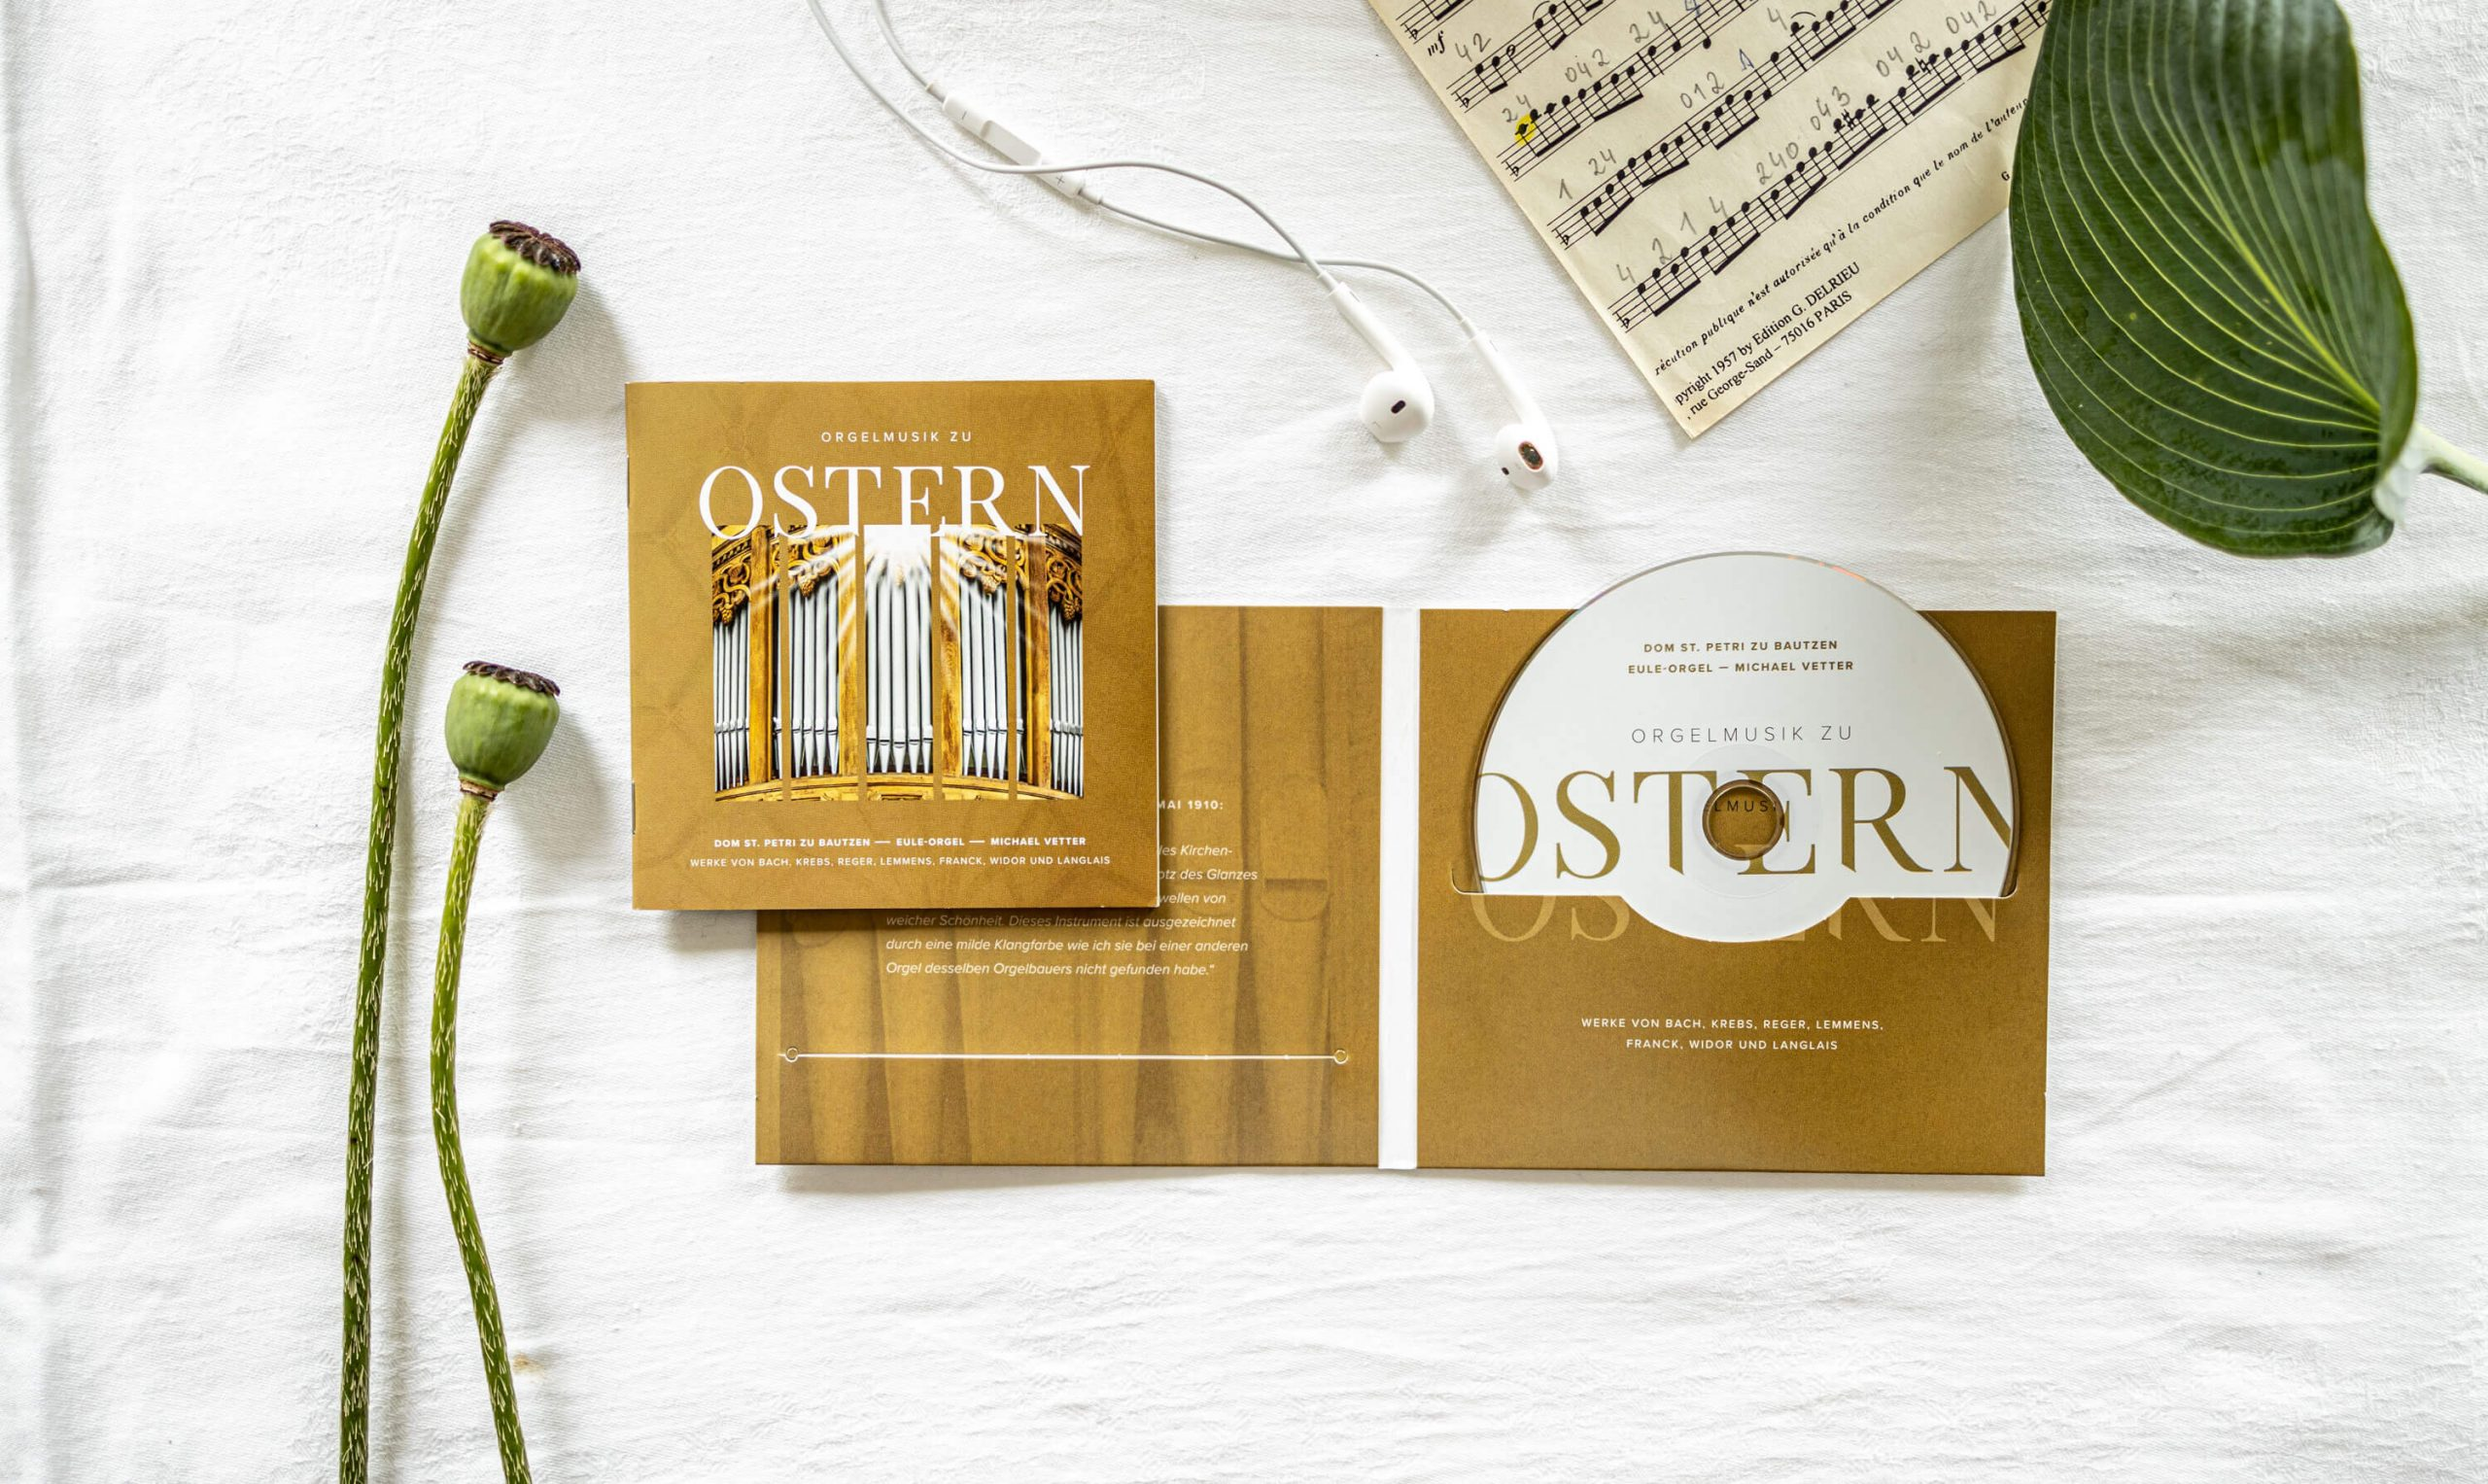 CD-Gestaltung — Eule Orgel im Dom St. Petri Bautzen